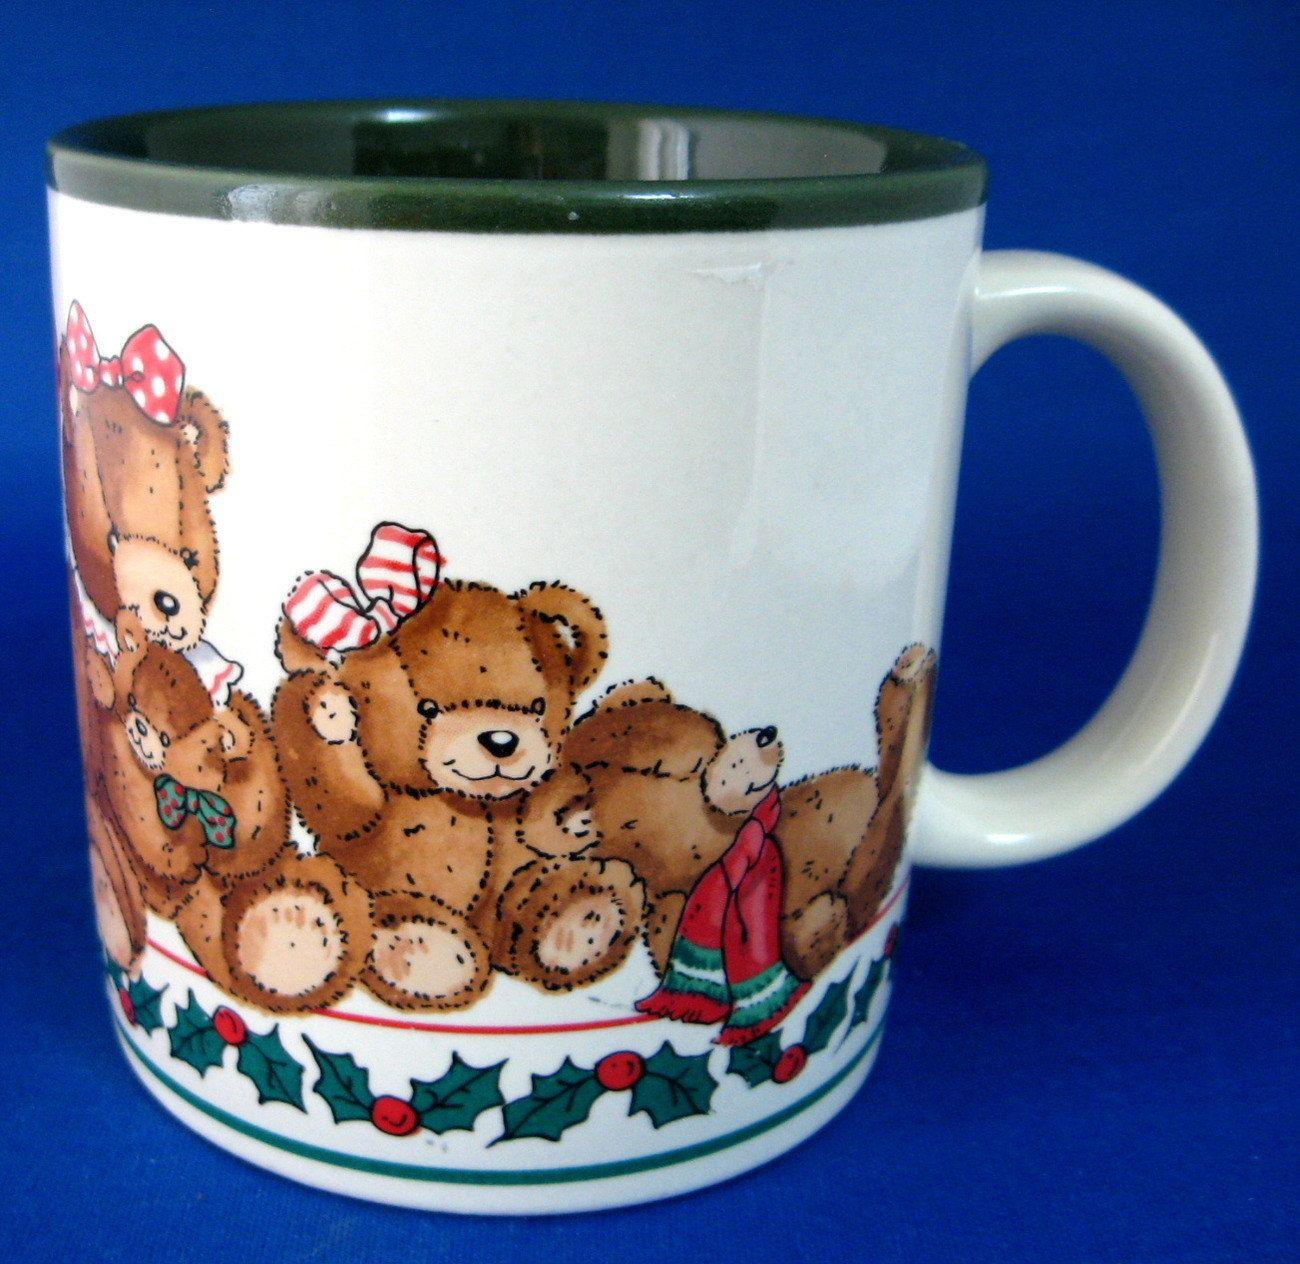 Christmas Mug Teddy Bears Holly Potpourri Press Green Interior Holiday Party Teddy Bear Christmas by RuthsBargains on Etsy